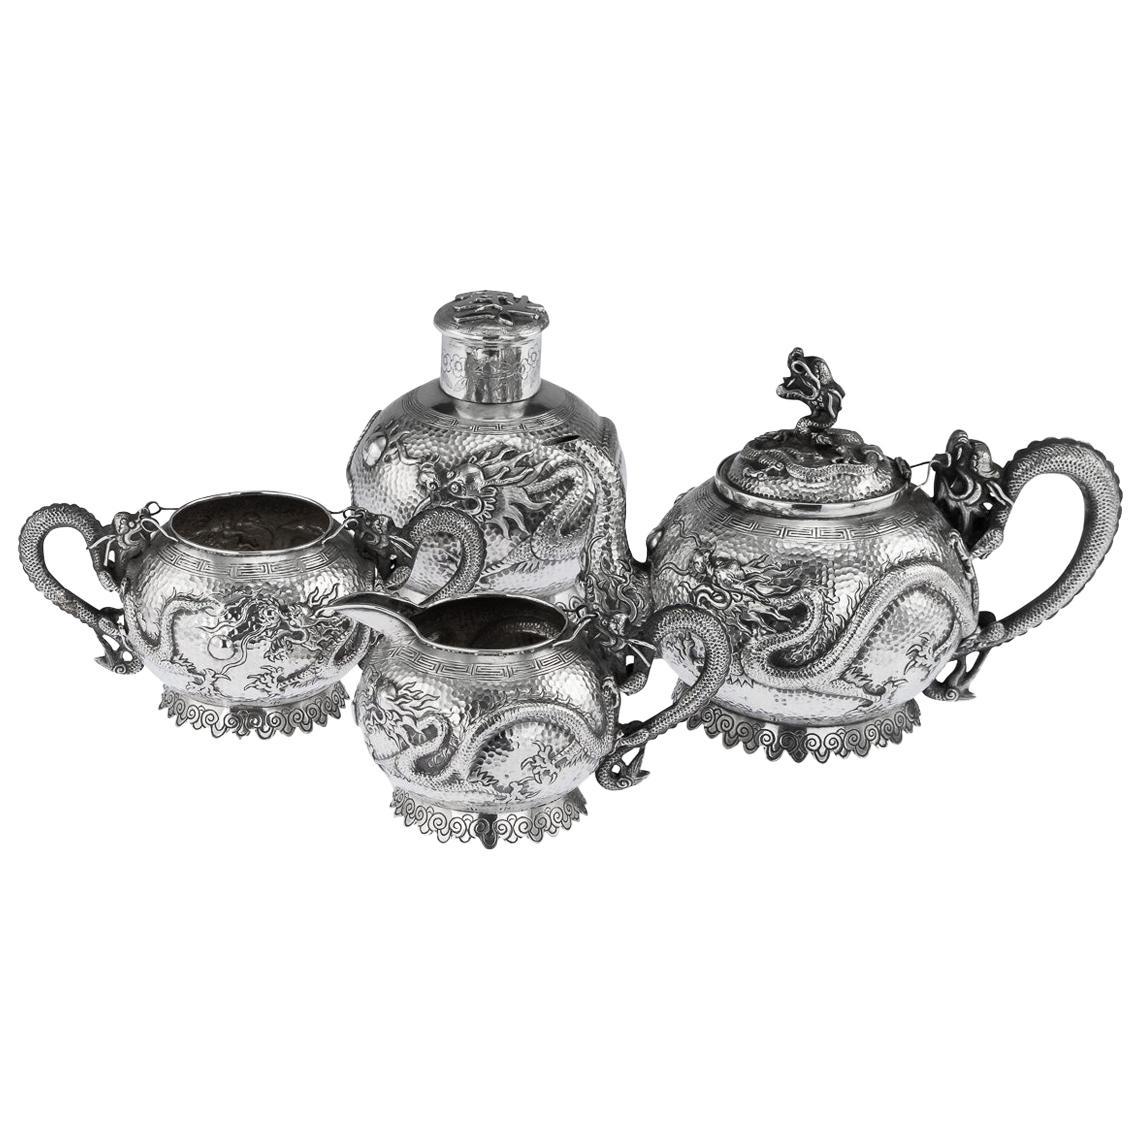 19th Century Chinese Export Tu Mao Xing Solid Silver Dragon Tea Set, circa 1890